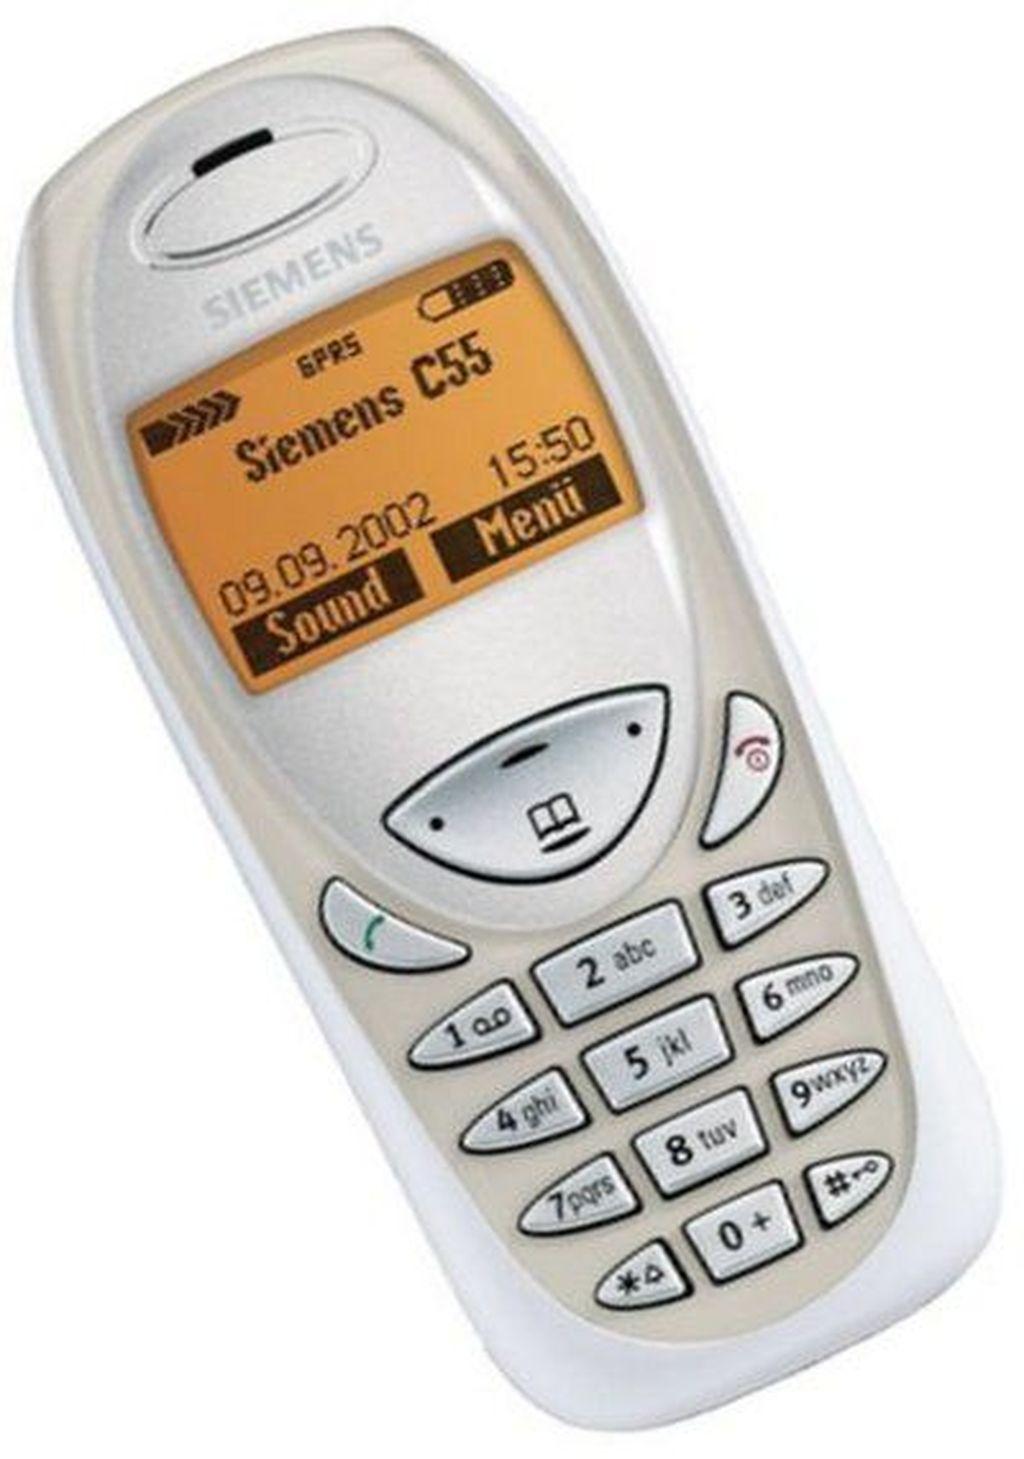 Salah satu ponsel favorit di masa kejayaan Siemens. Rilis tahun 2002, ini adalah Siemens C55. (istimewa/phonearena)